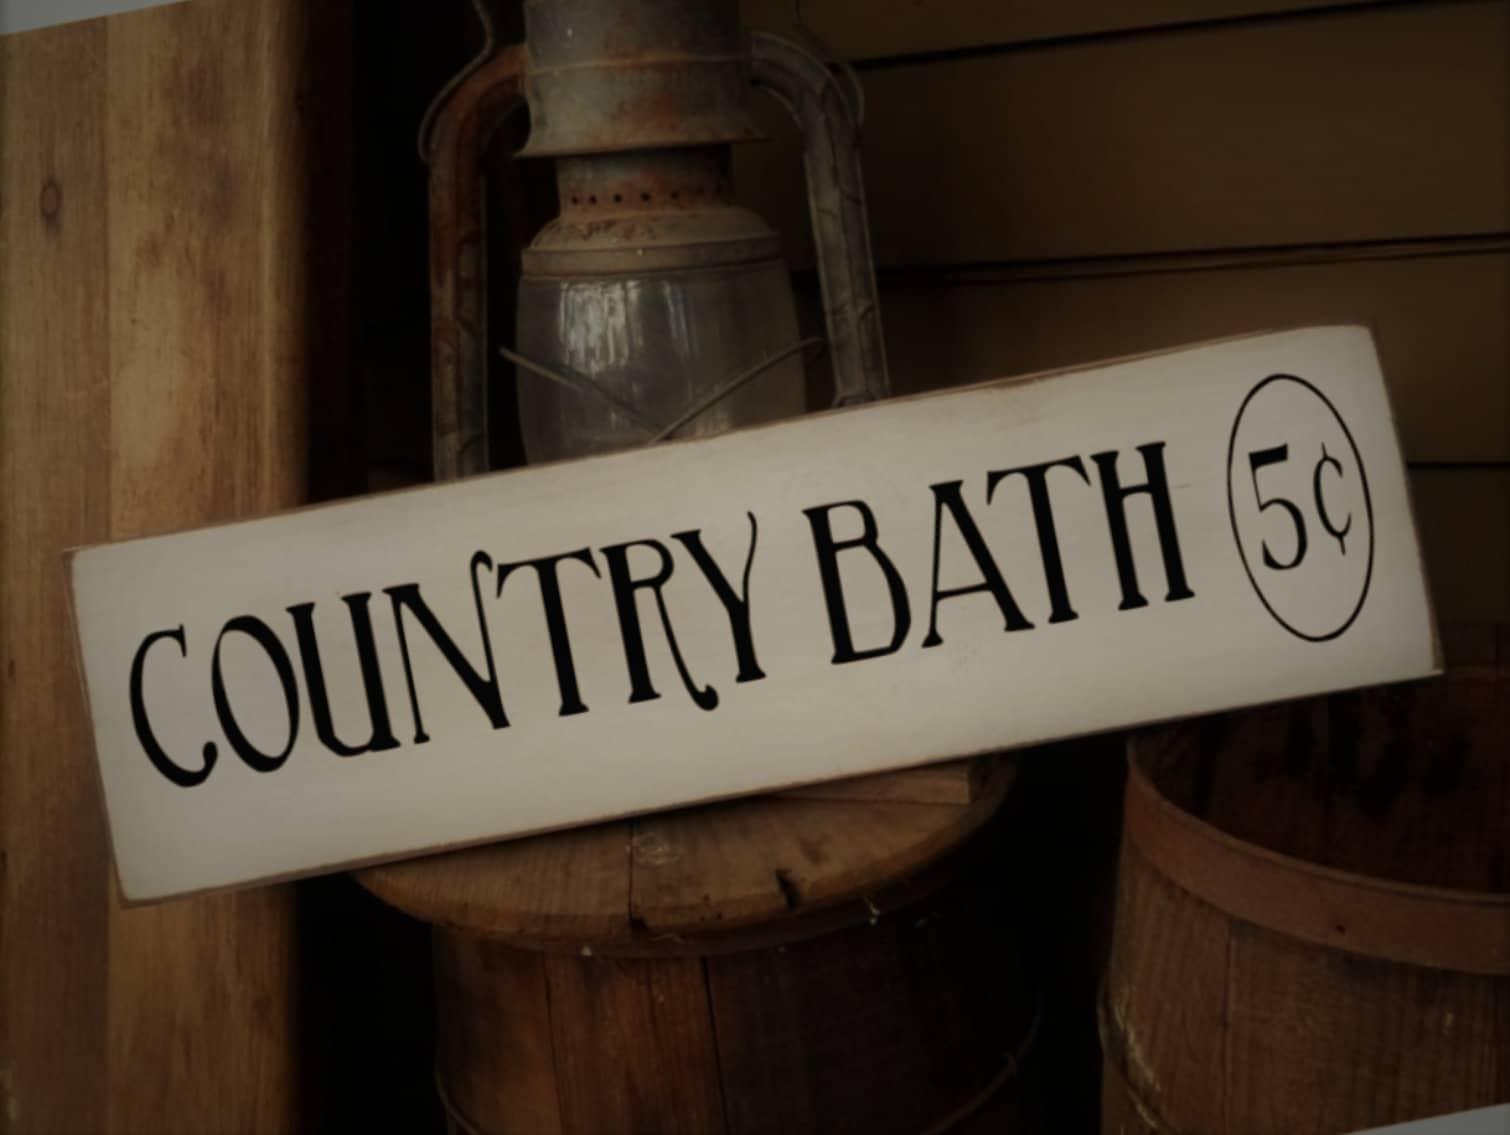 Farmhouse Decor Rustic Bathroom Decor Wooden Sign